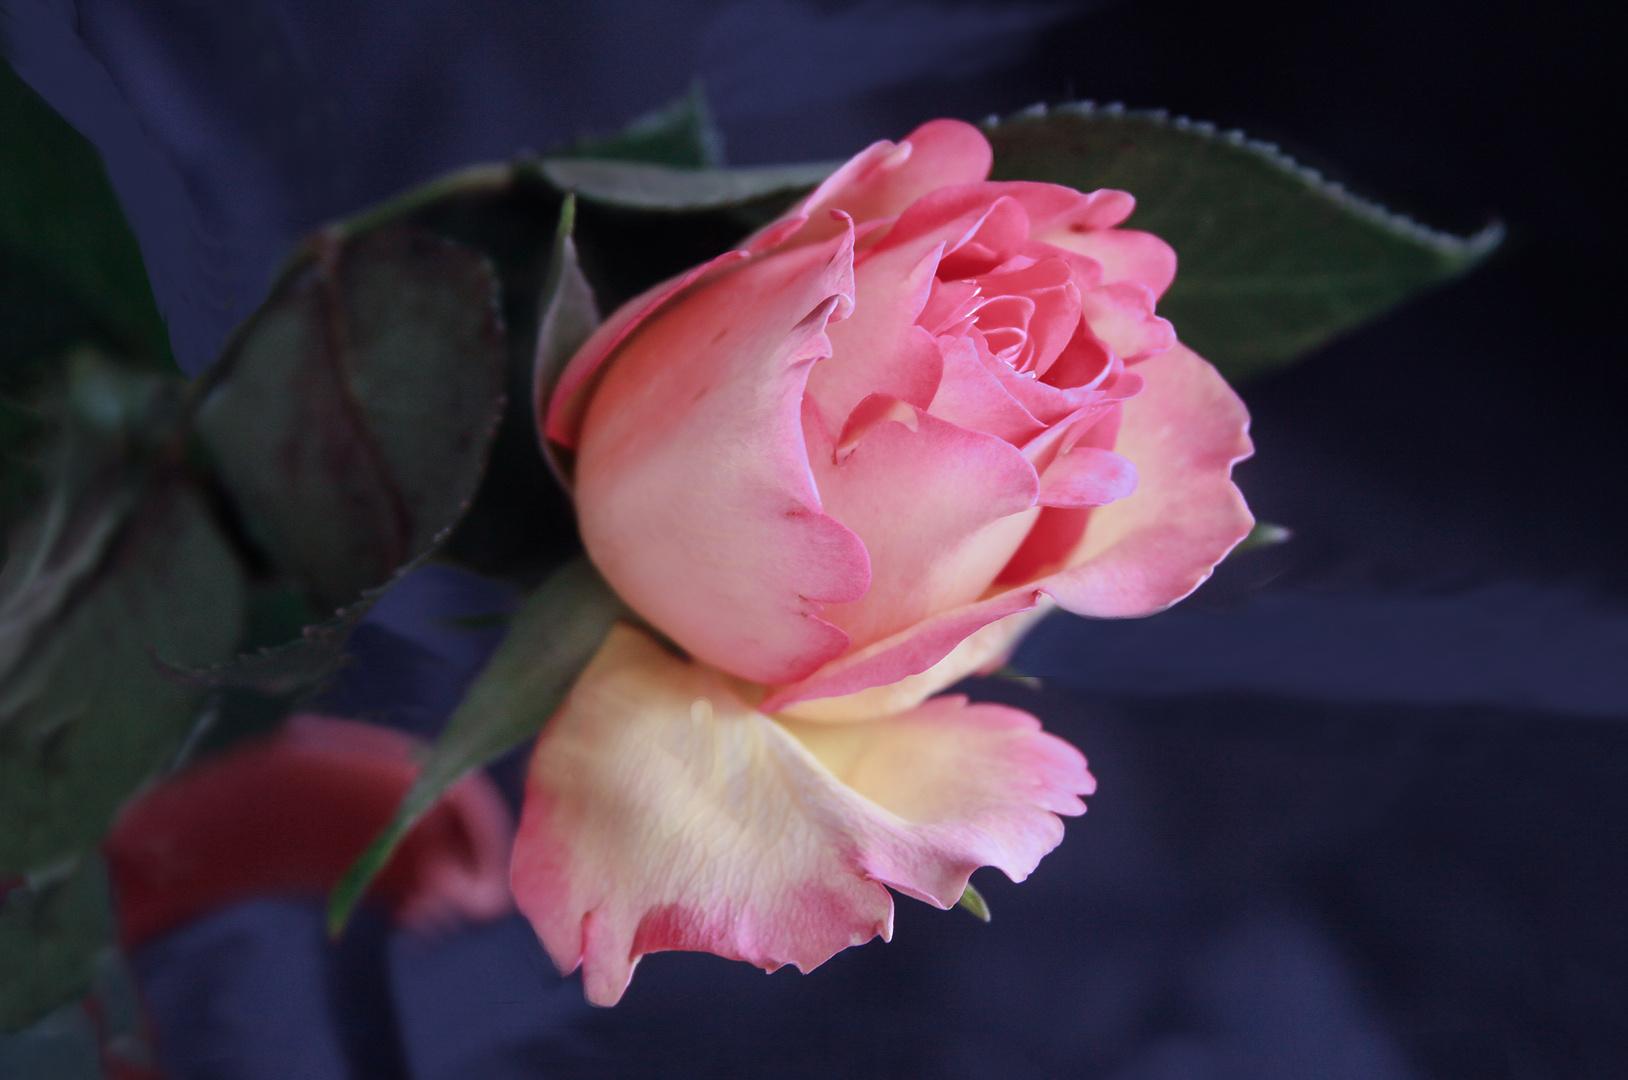 Una rosa apaisada